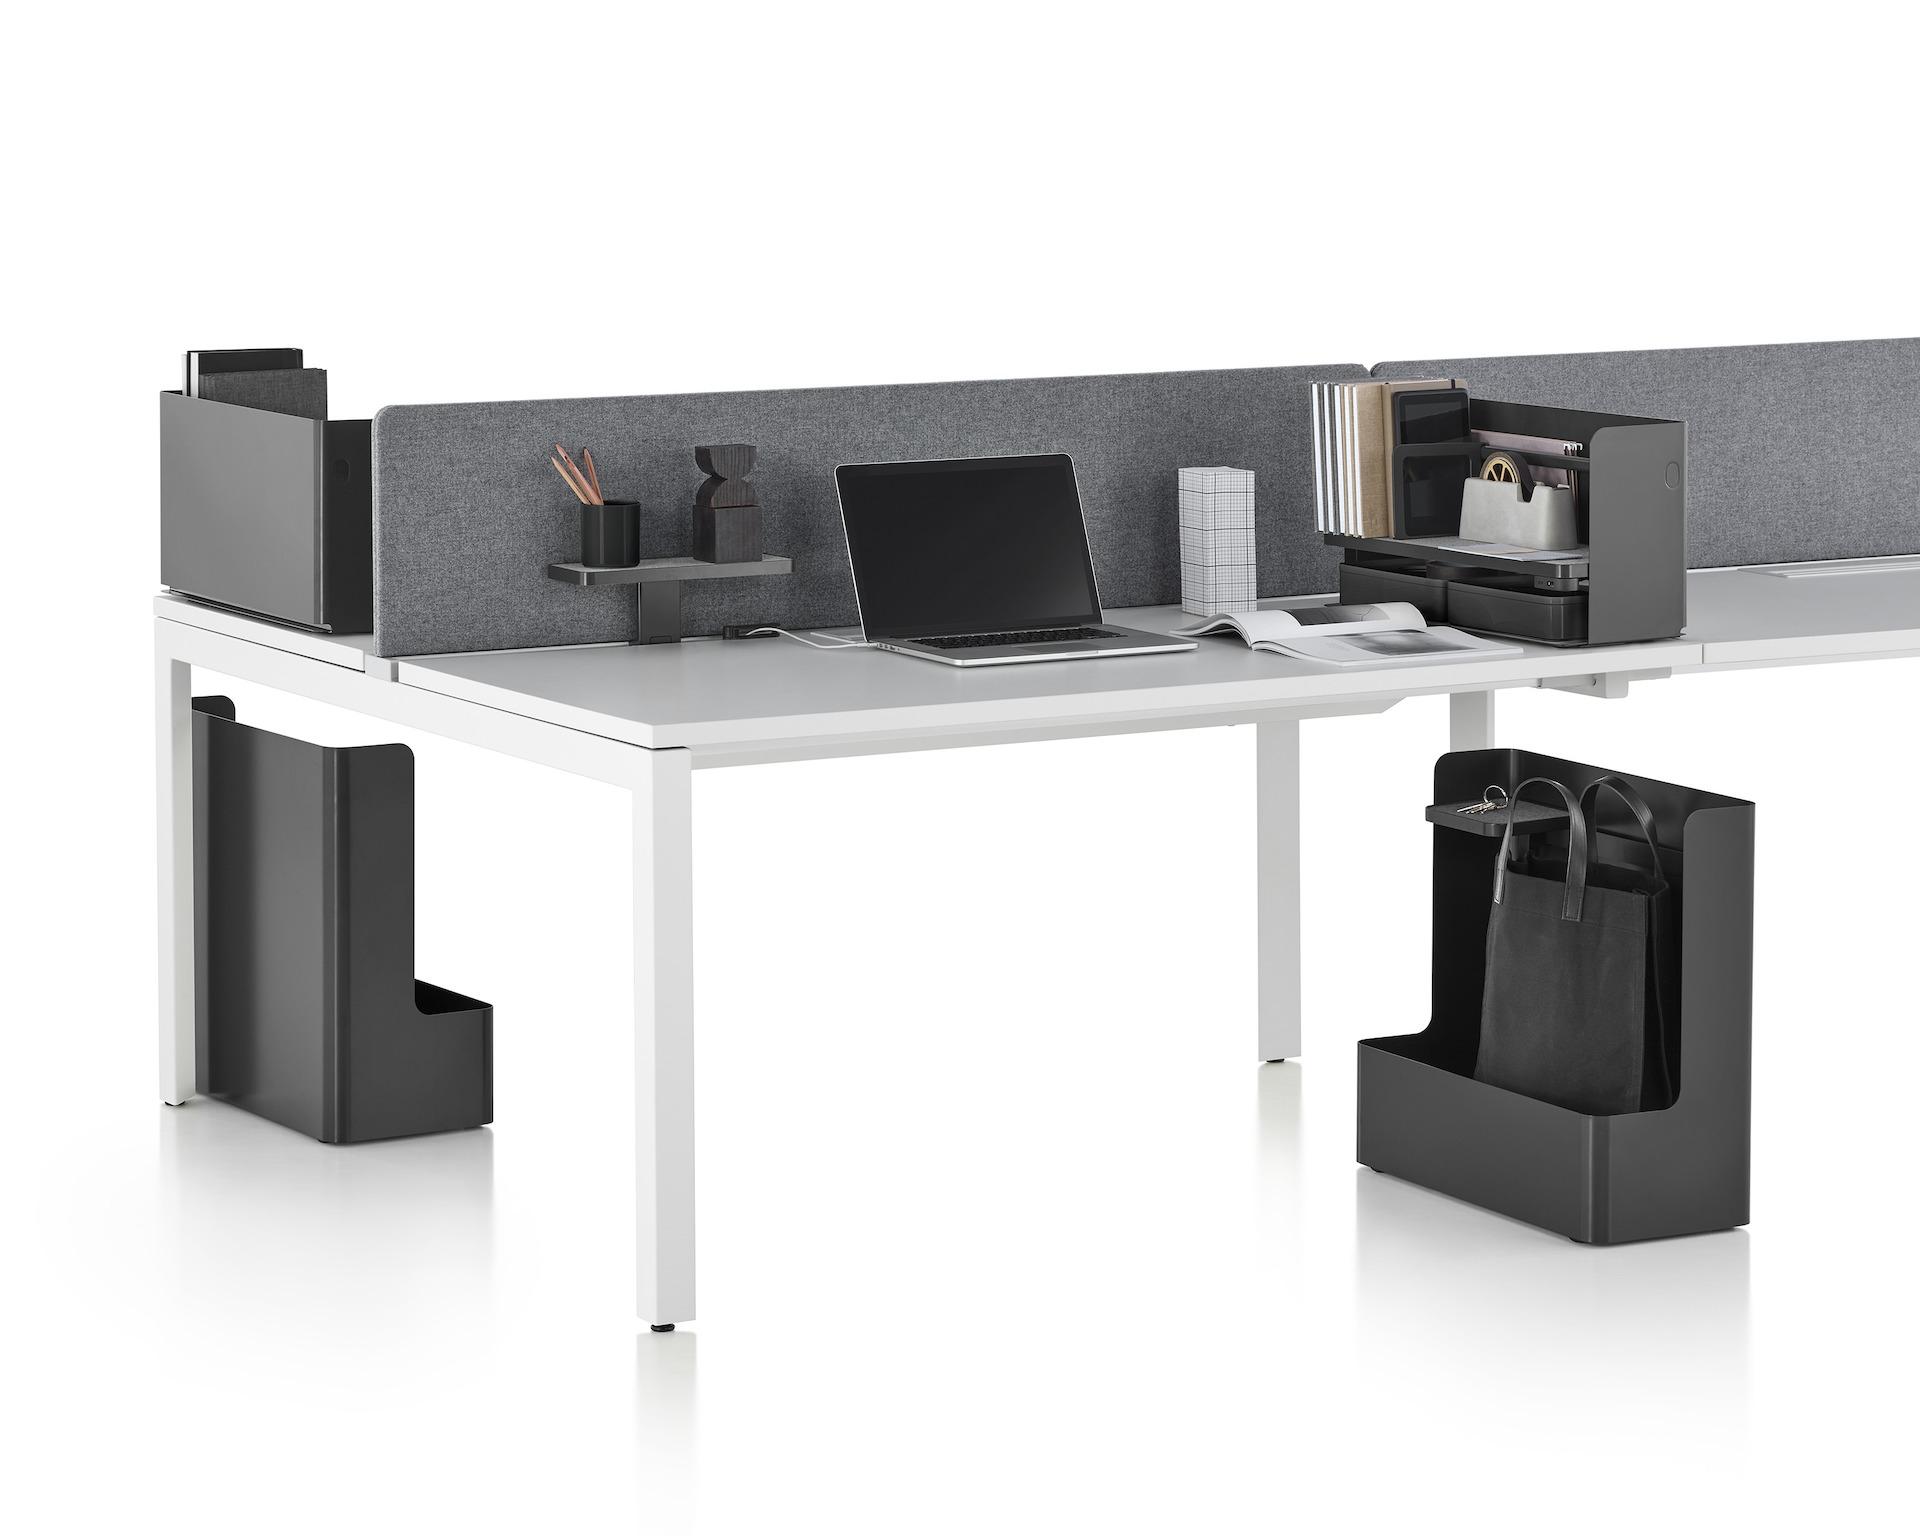 Herman Miller Desk Accessories Desk Ideas